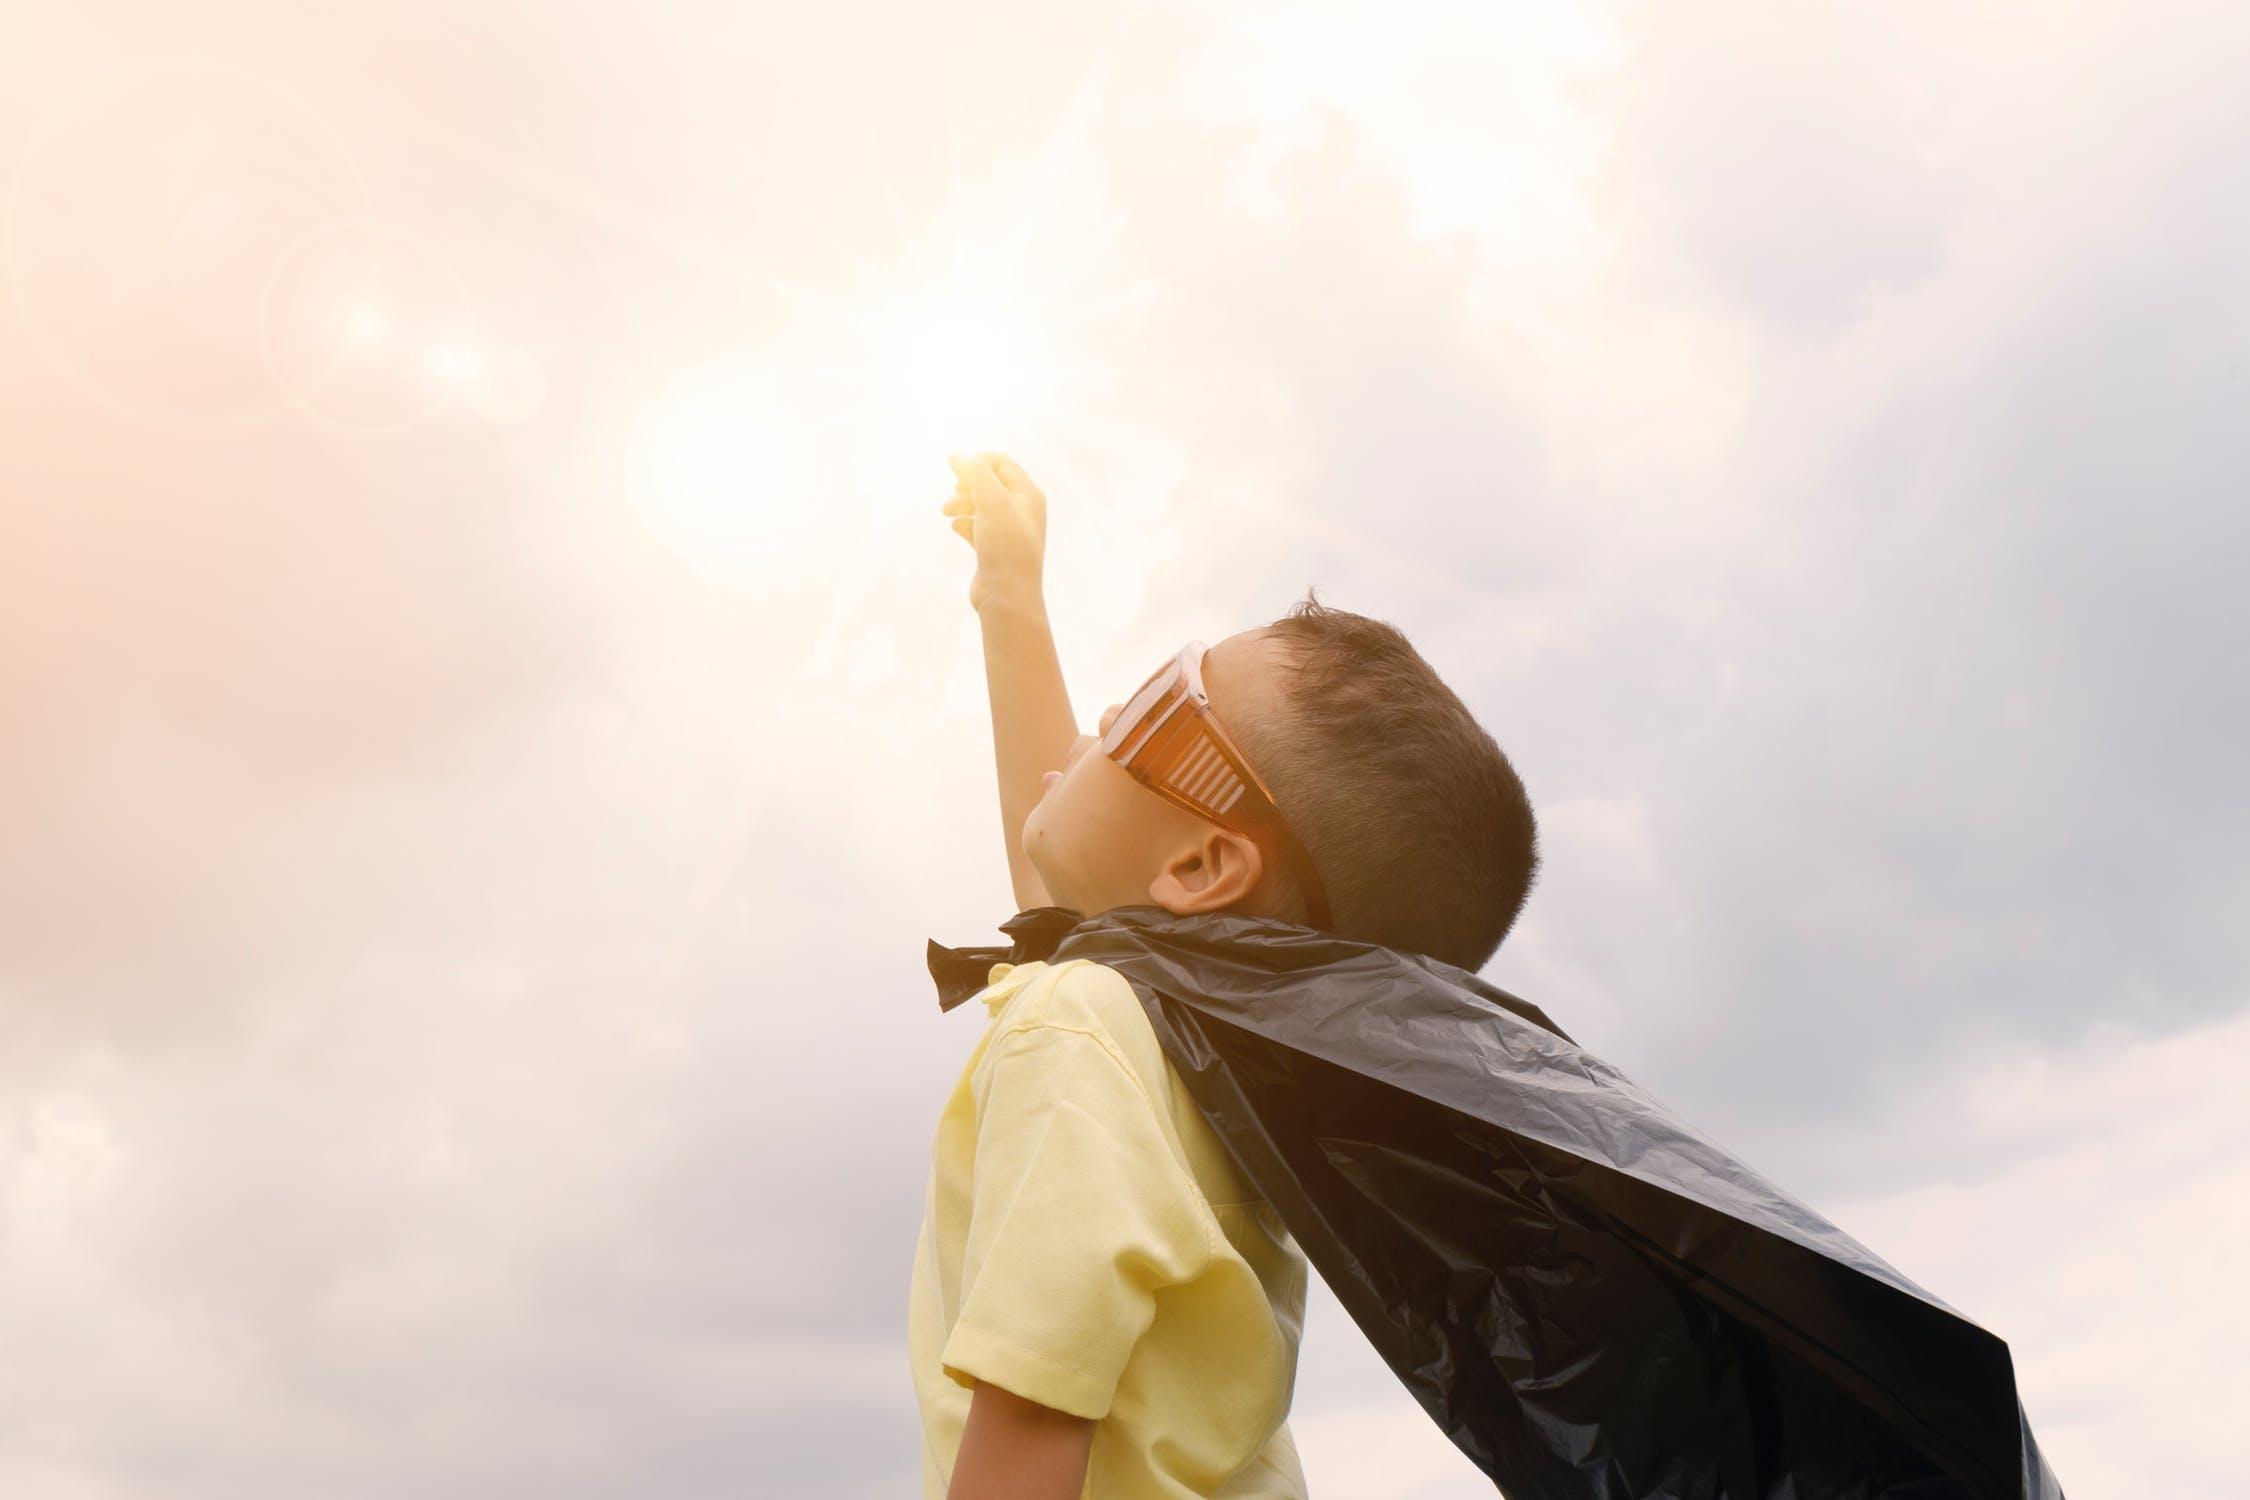 liderazgo-niños-escuela-educacion-kinder-preescolar-maternal-superheroe